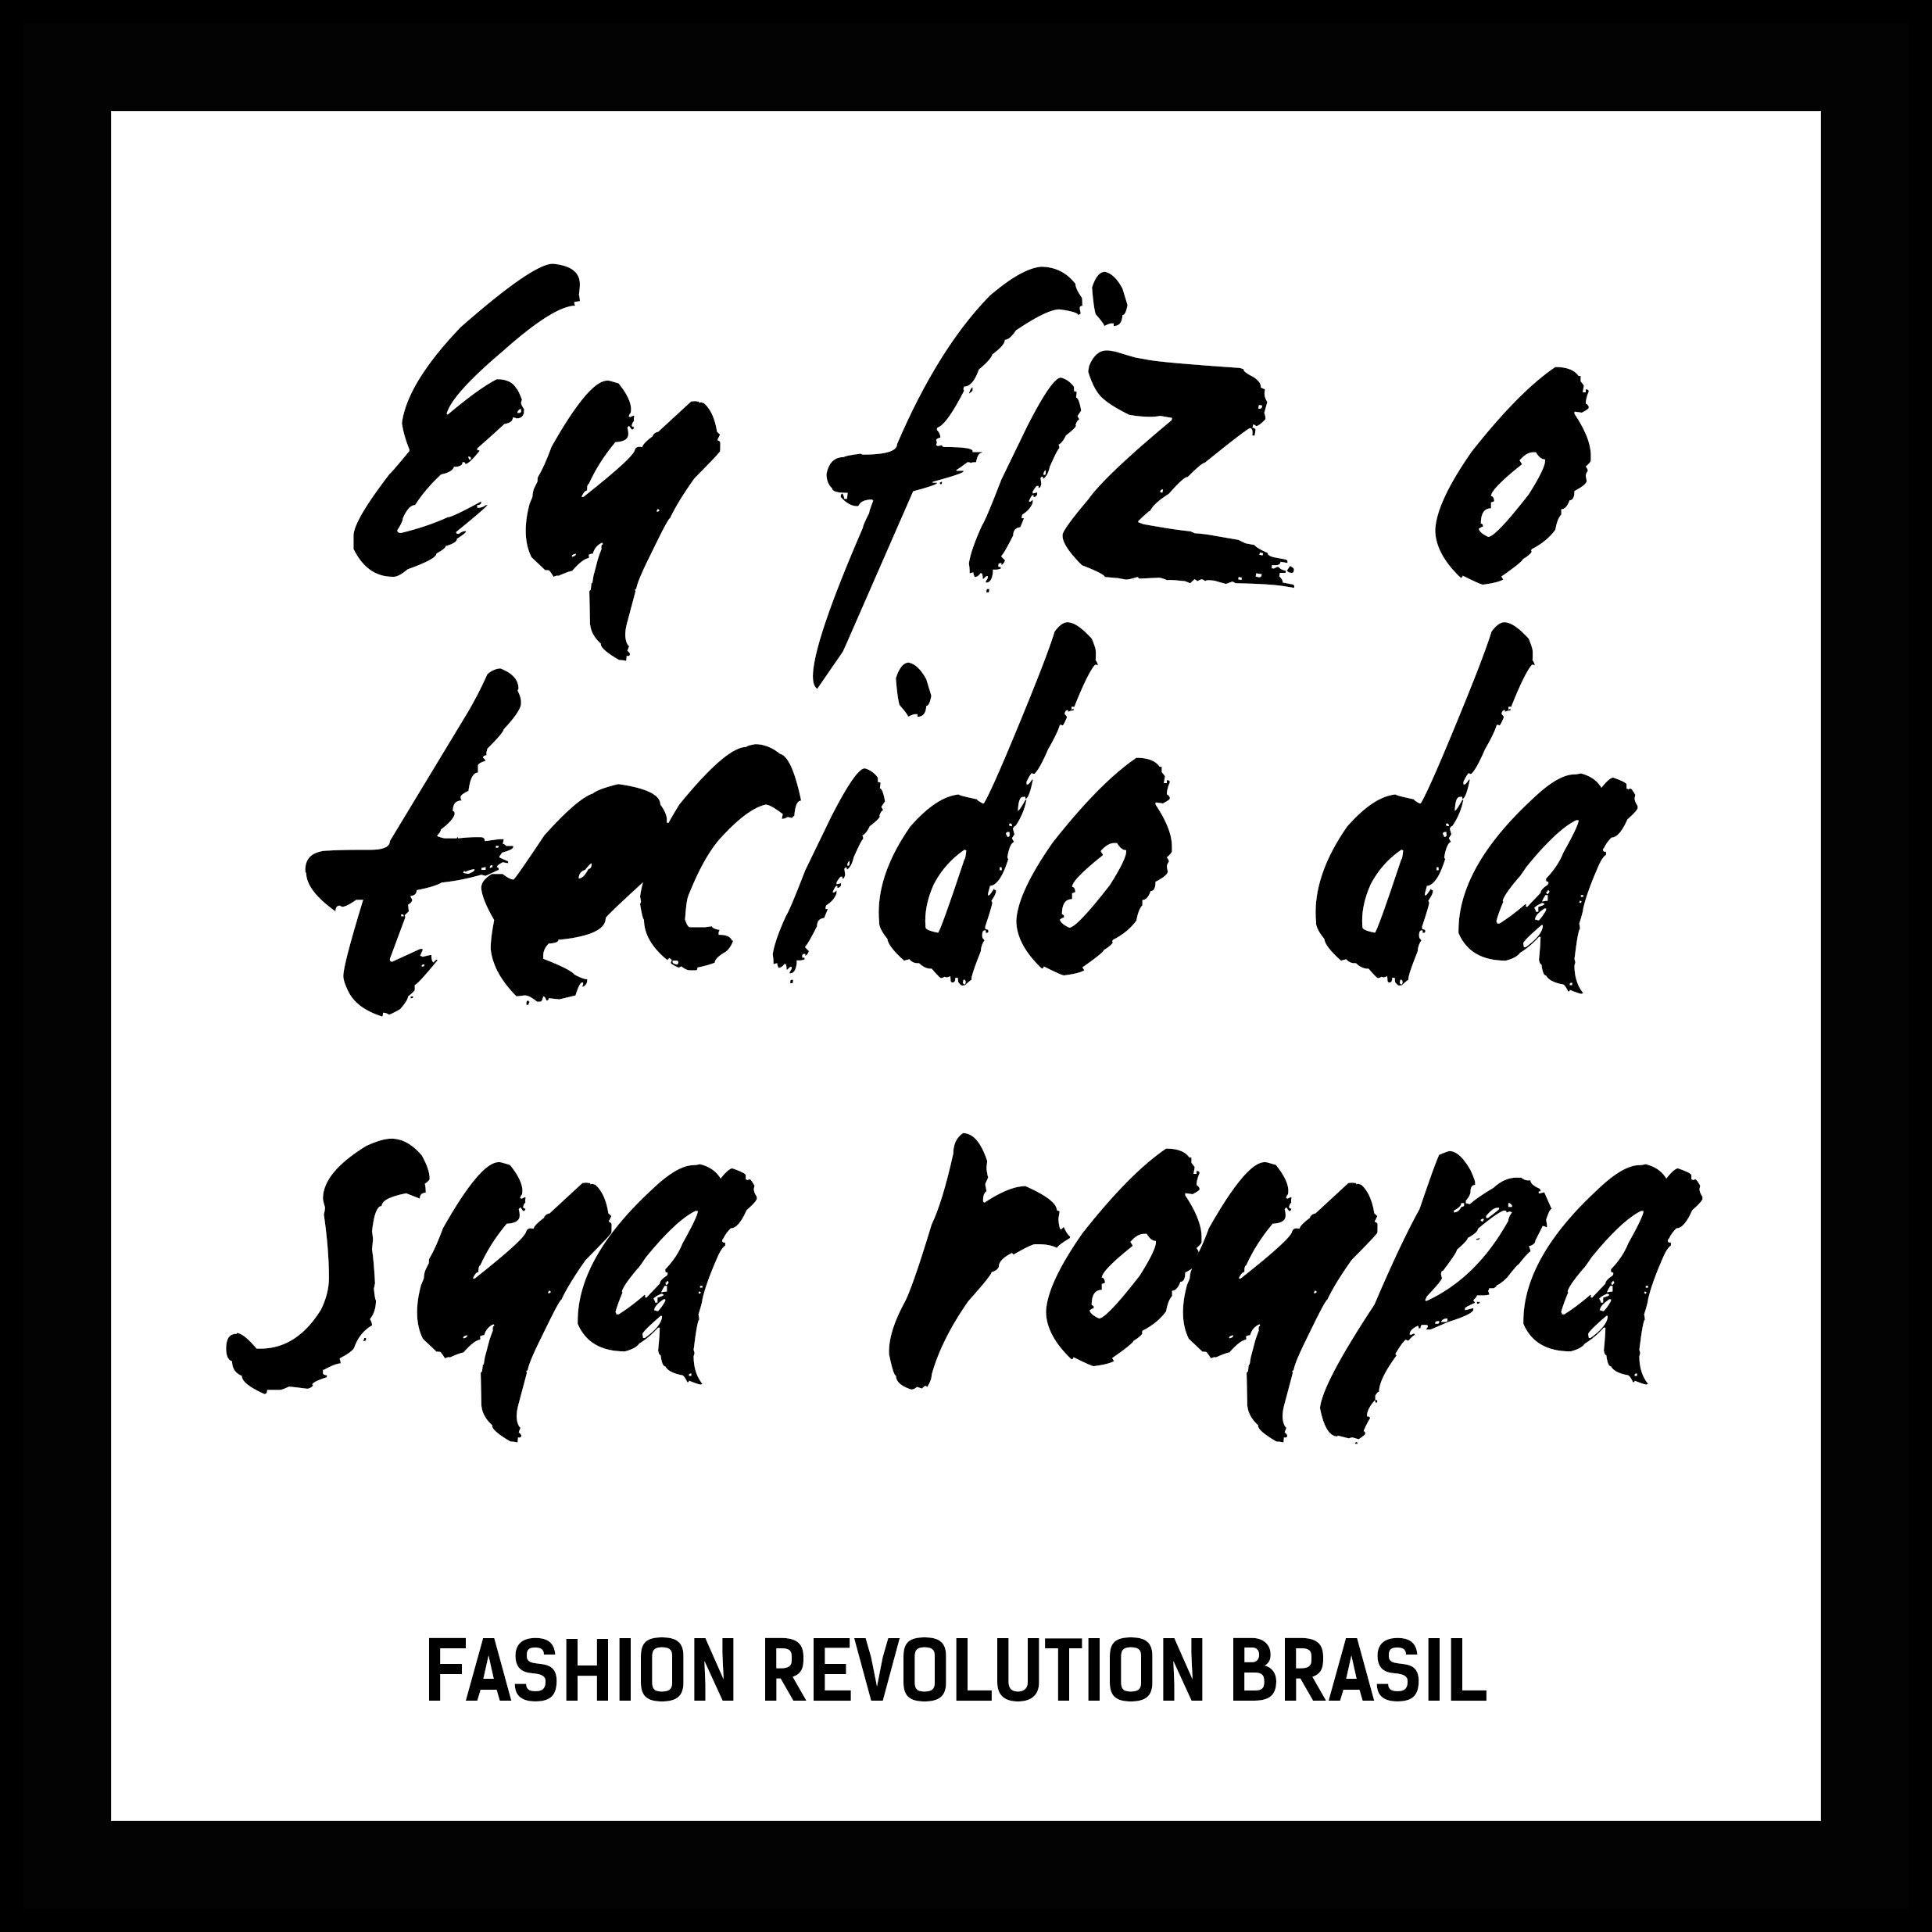 Fashionrevolution Quemfezminhasroupas Whomademyclothes Fashionrevolutionbrasil Sustainablefashion Sustent Moda Sustentavel Frases Sobre Moda Moda Etica